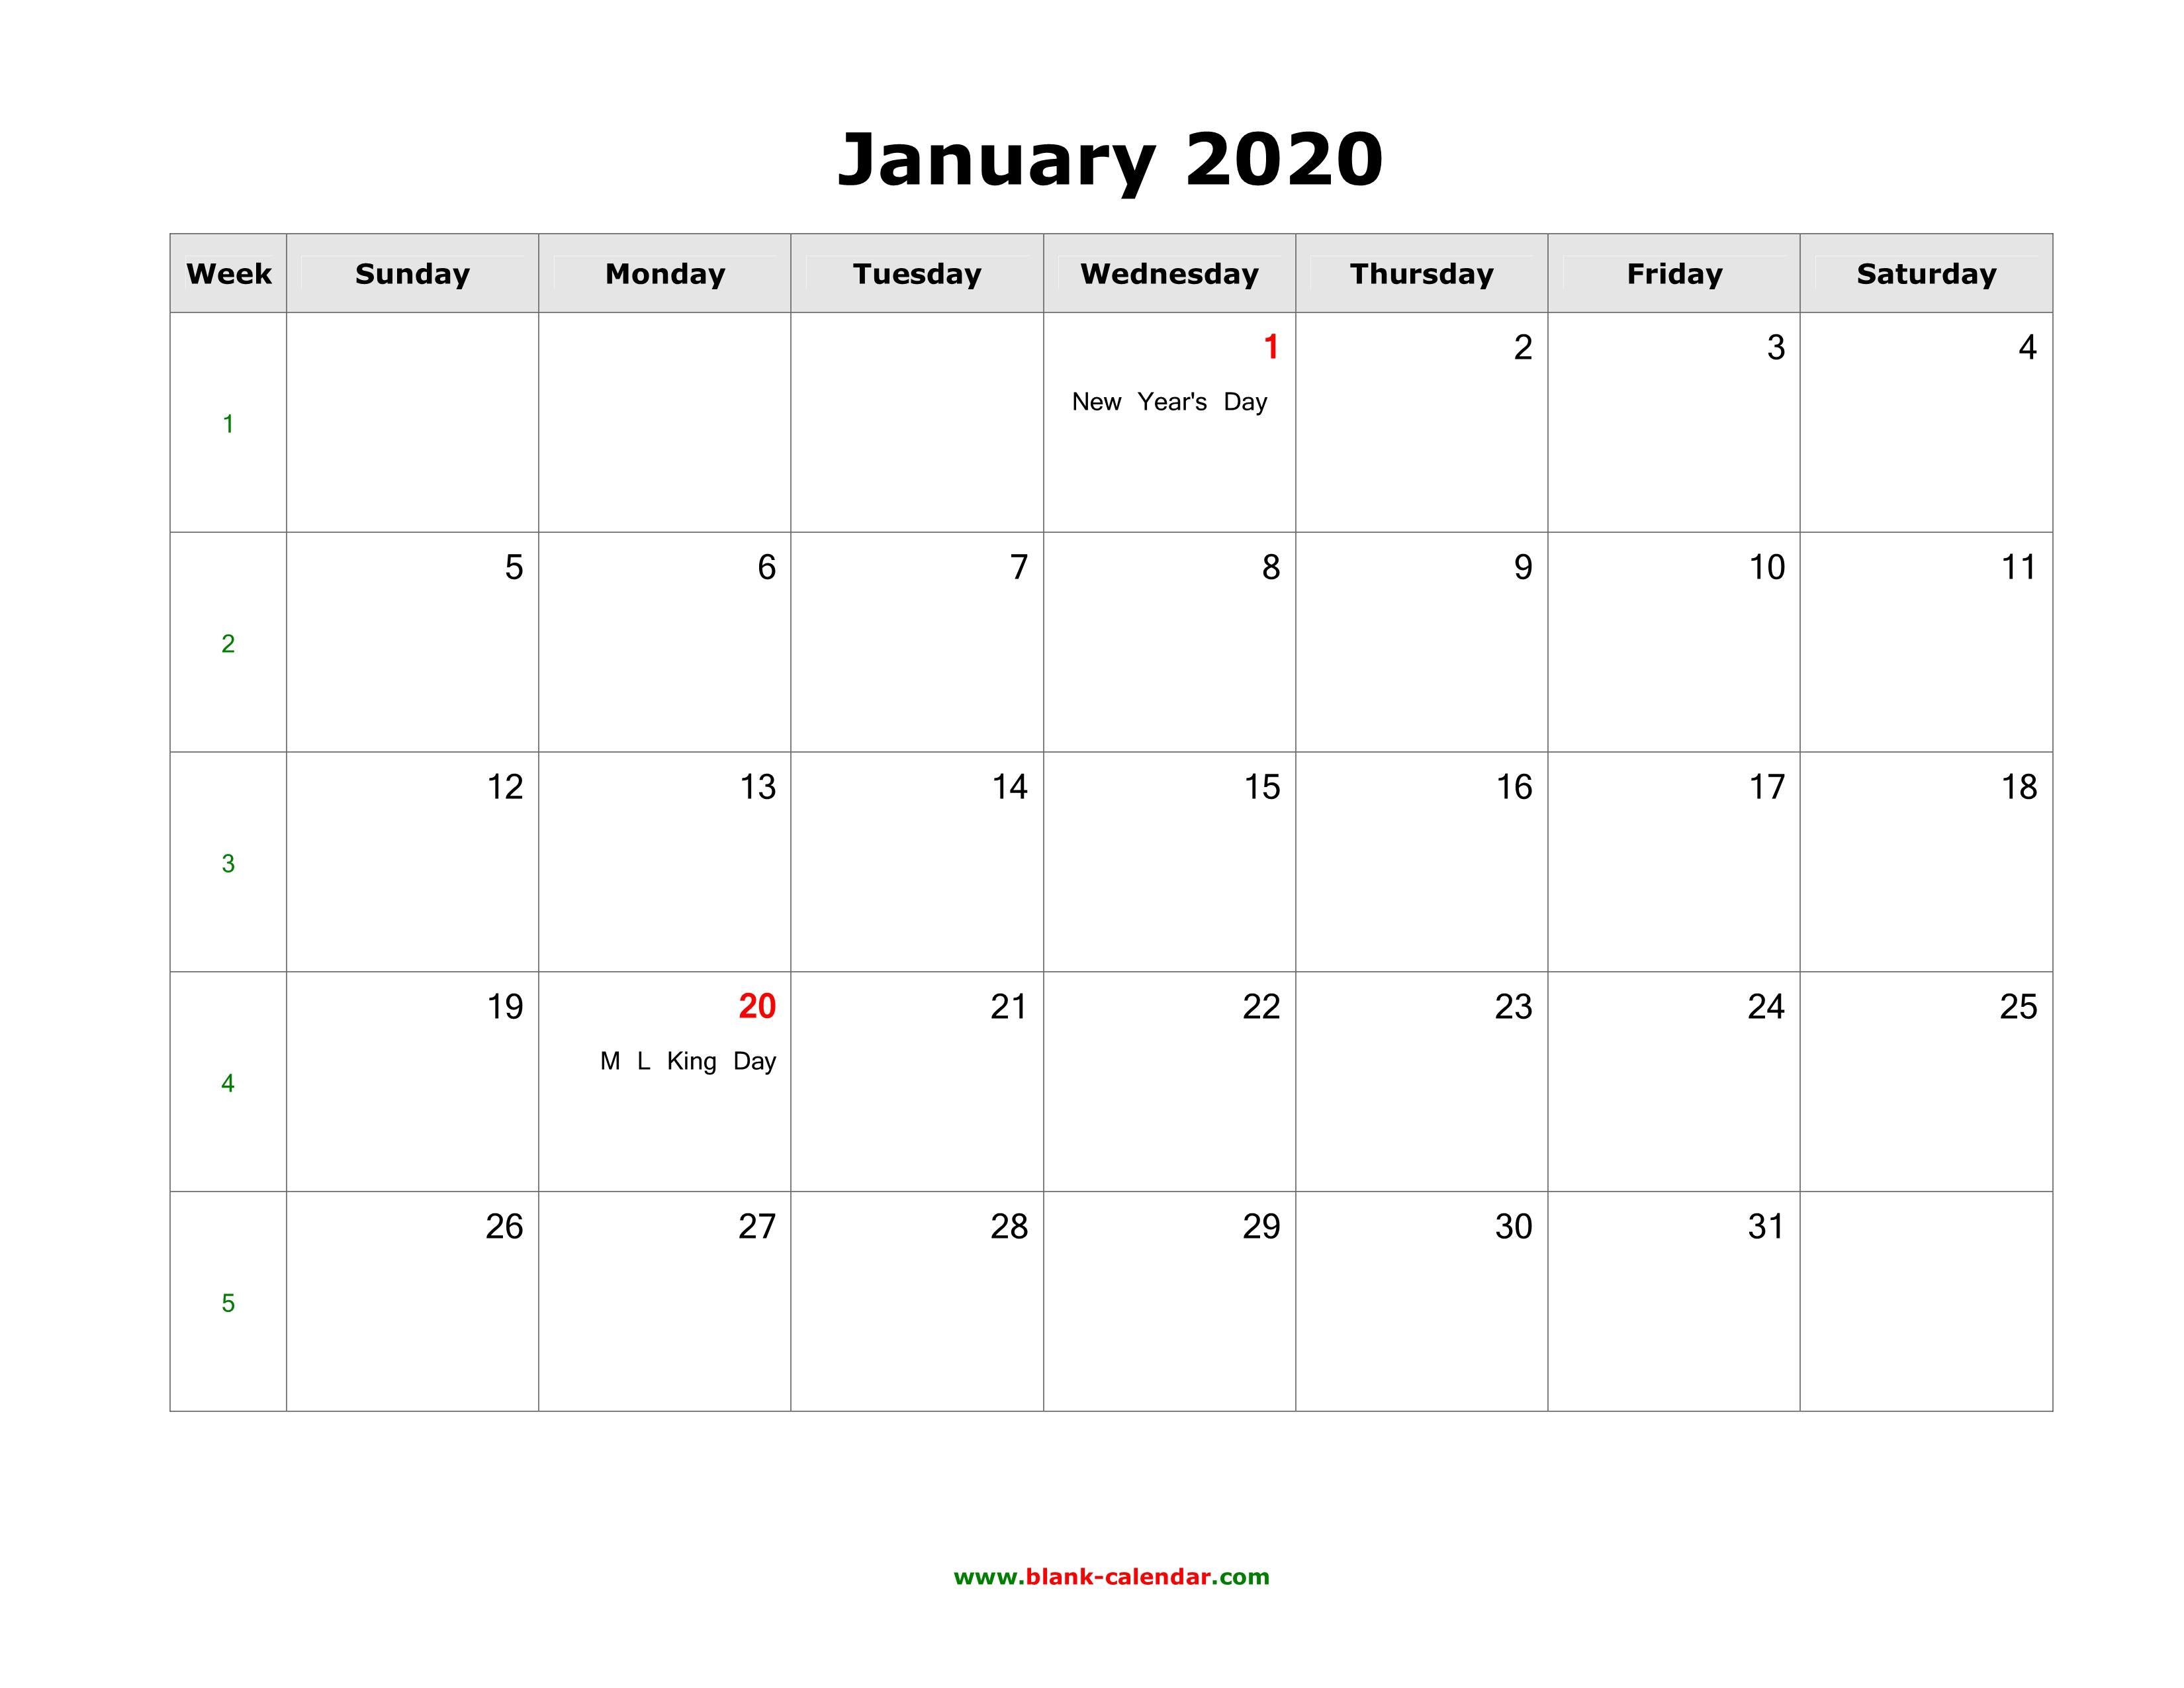 January 2020 Blank Calendar | Free Download Calendar Templates throughout Blank 2020 Calendars To Edit